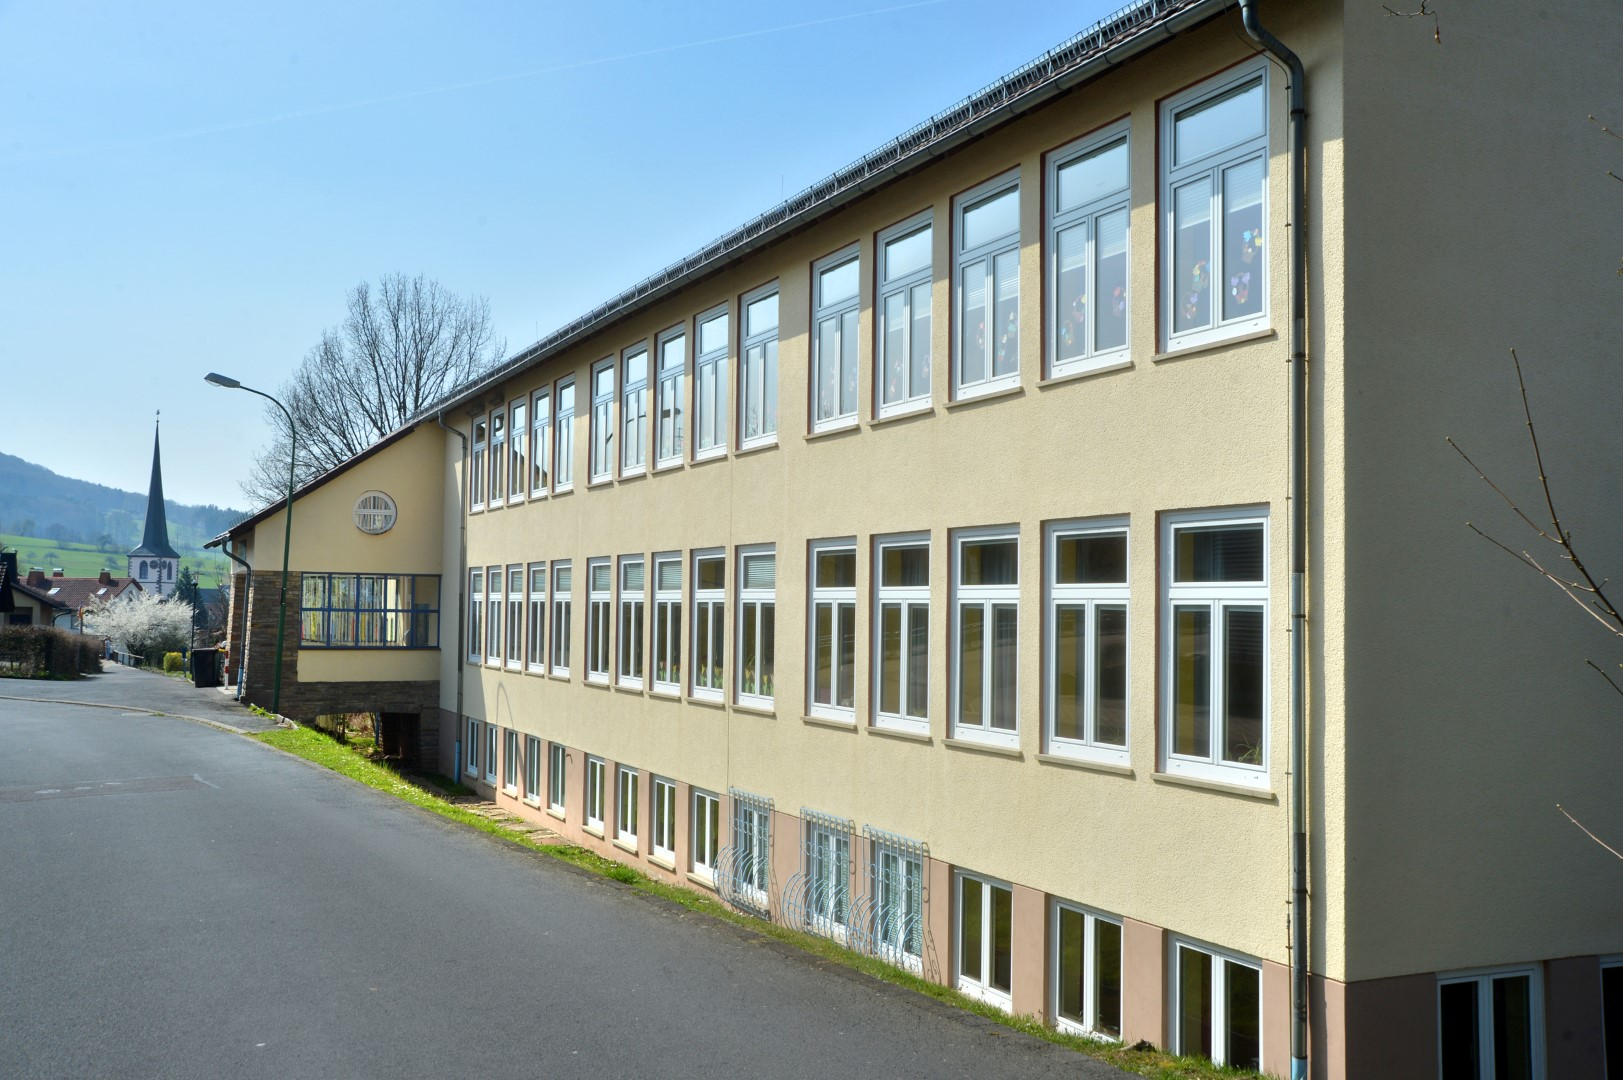 Grundschule Poppenhausen